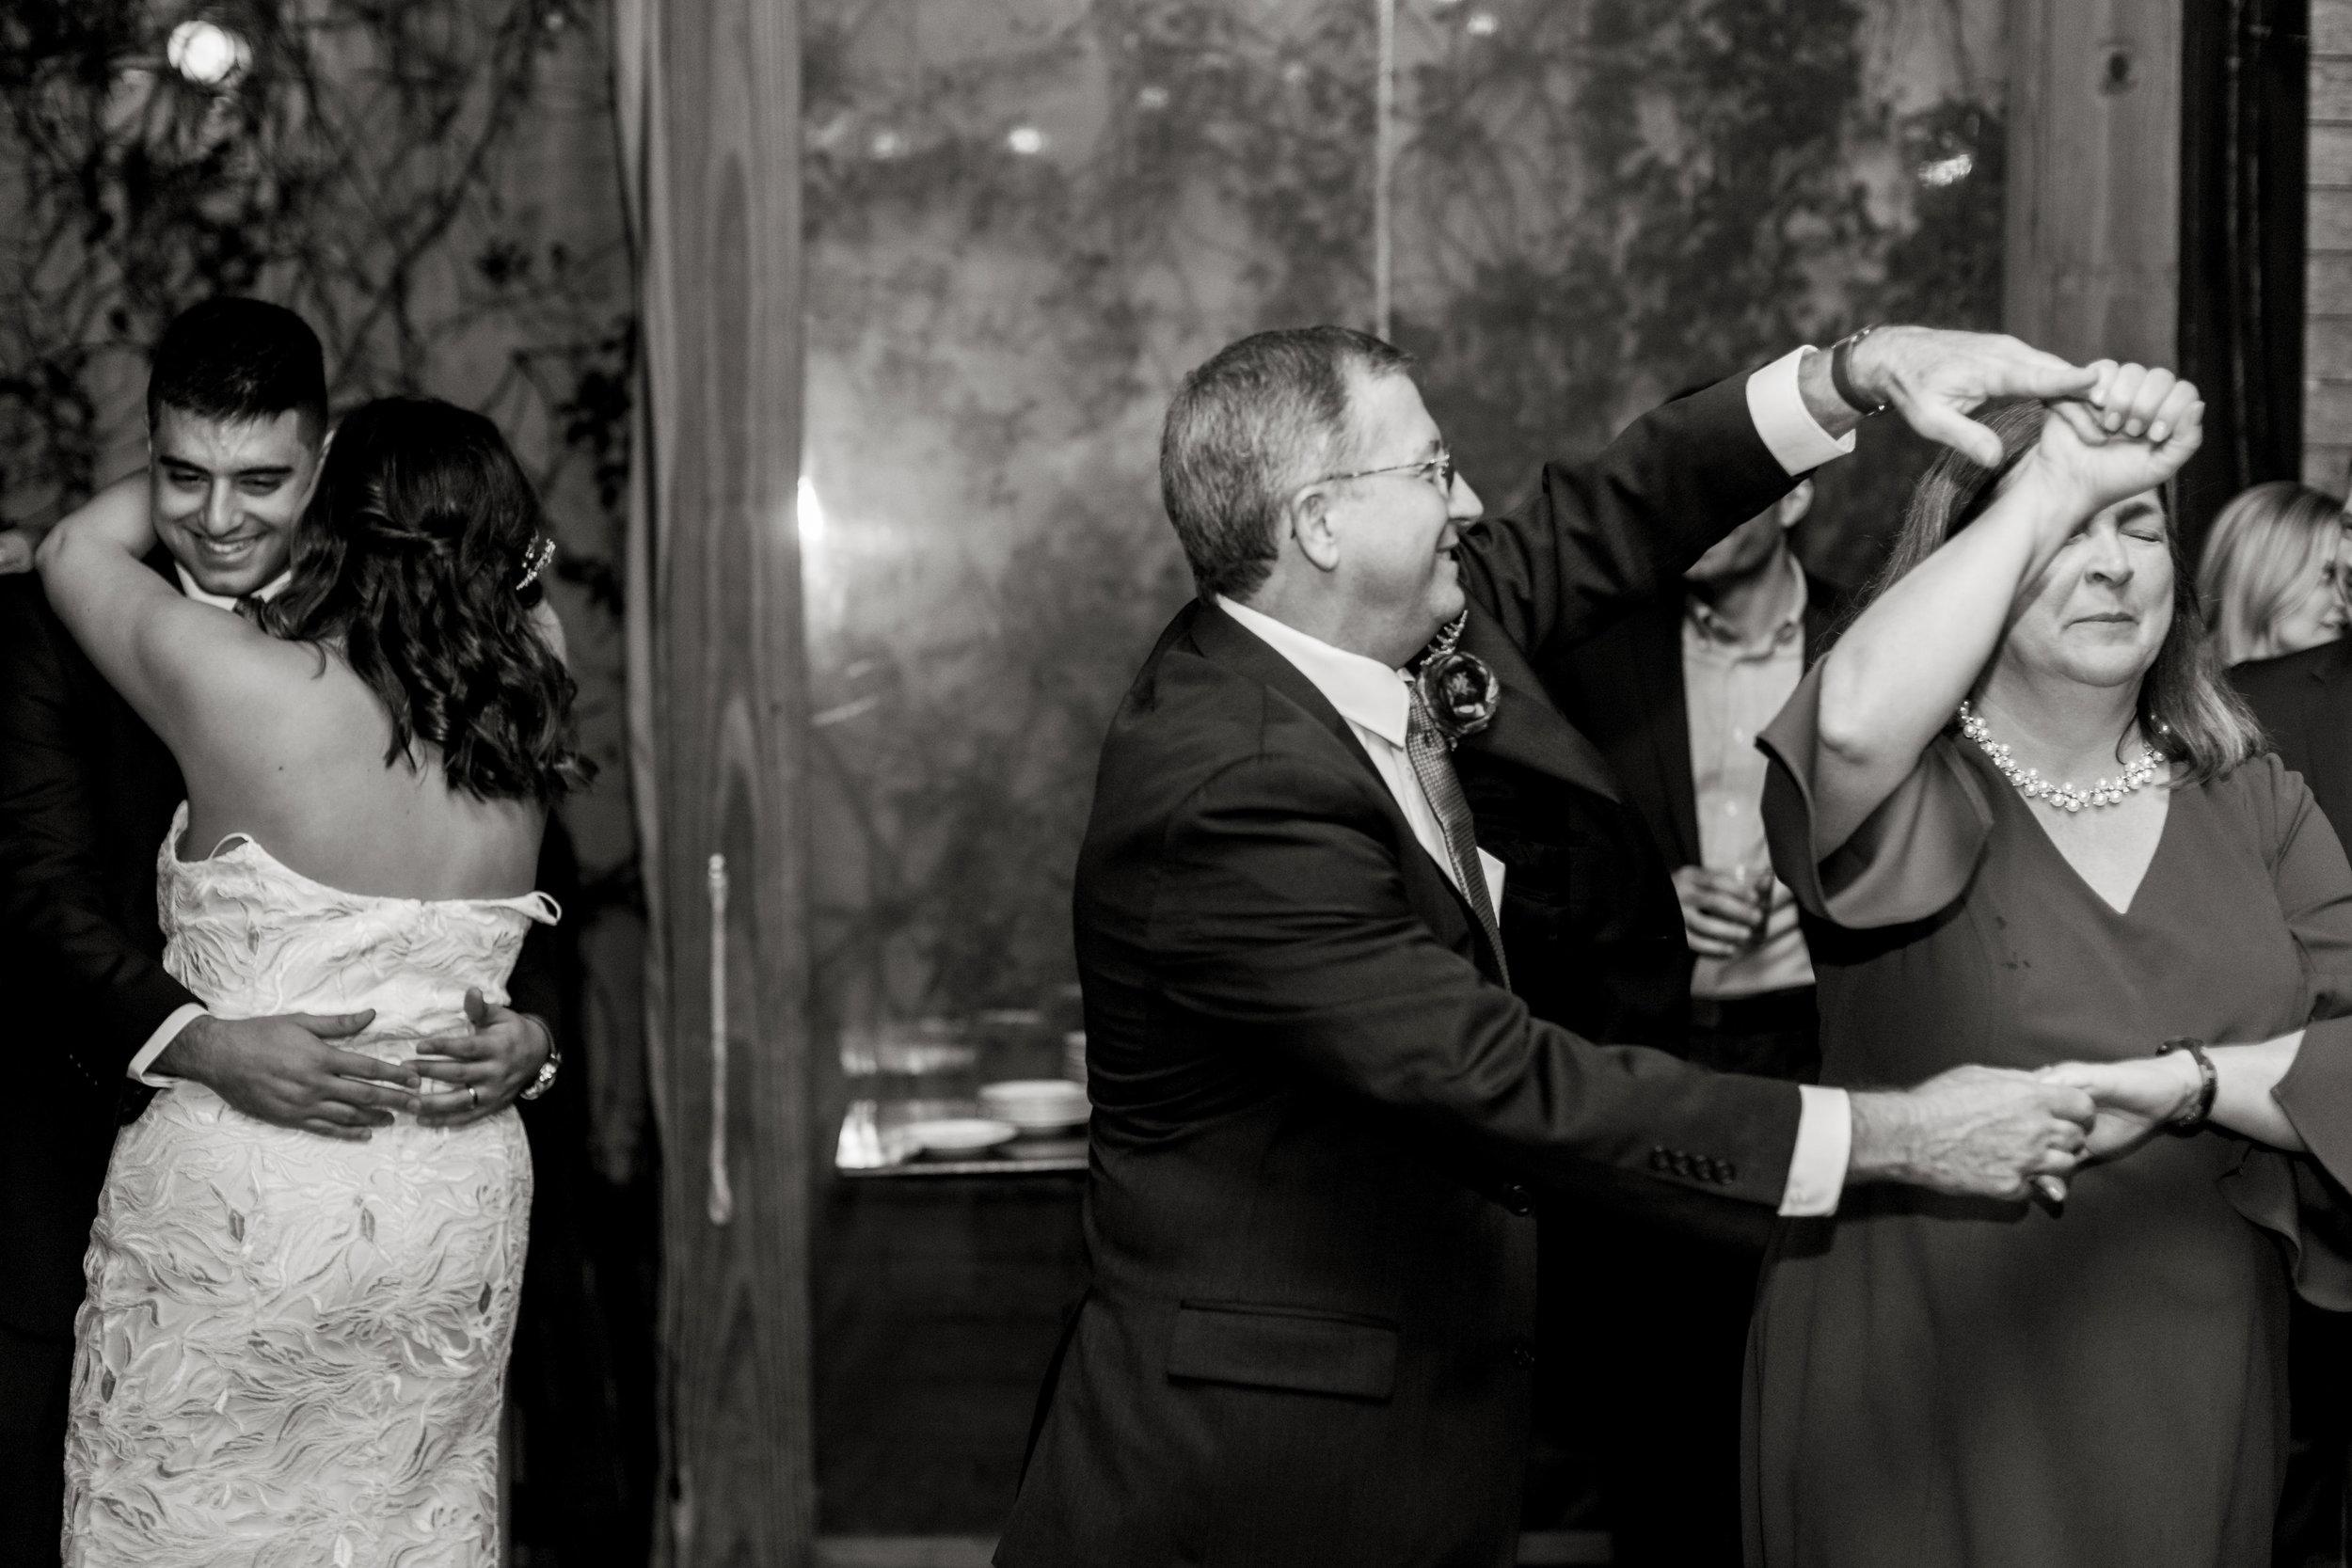 charleston new years elopement popup surprise wedding at upstairs at midtown - scarlet plan & design wedding planners (374).jpg